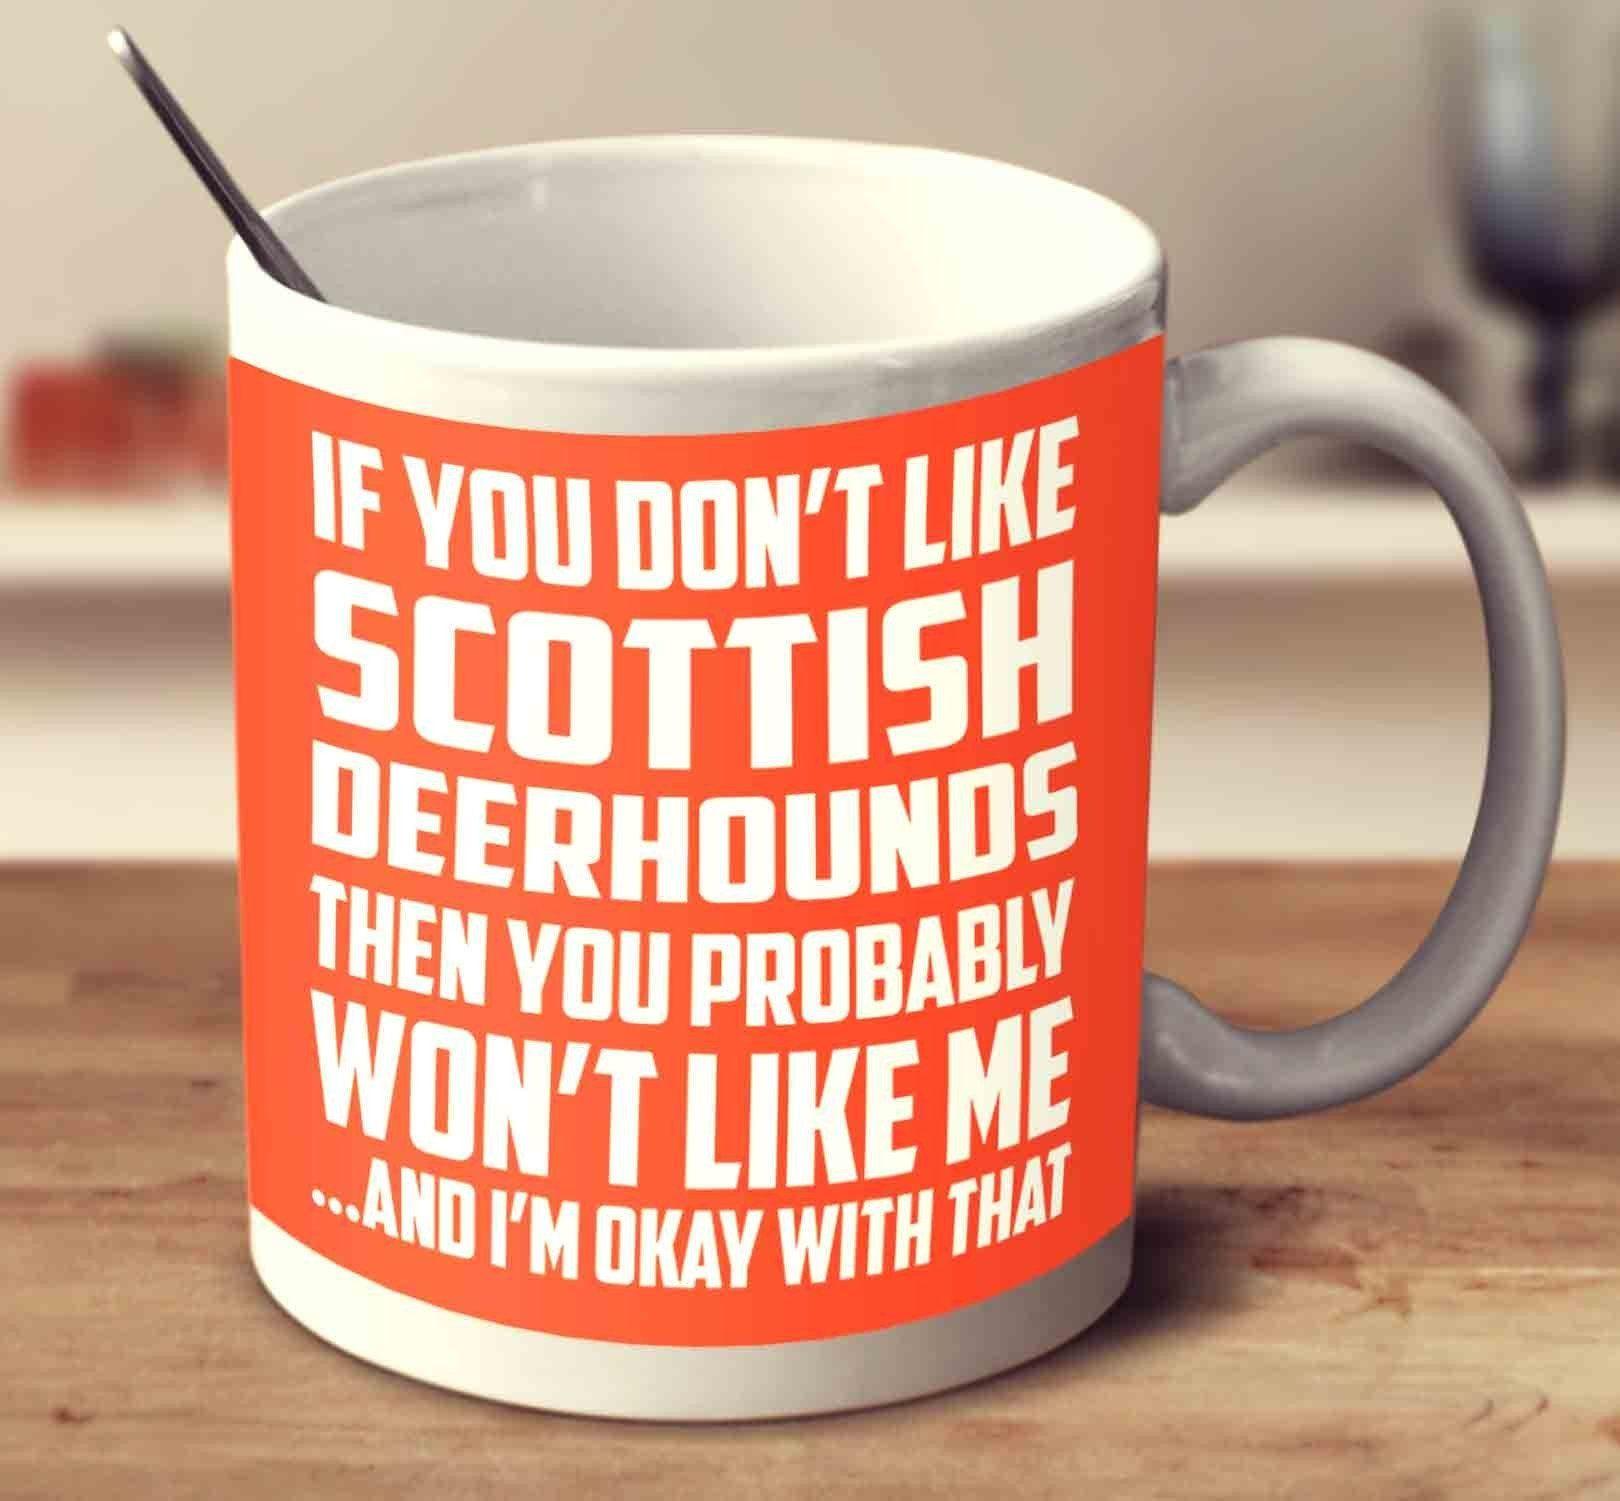 If You Don't Like Scottish Deerhounds